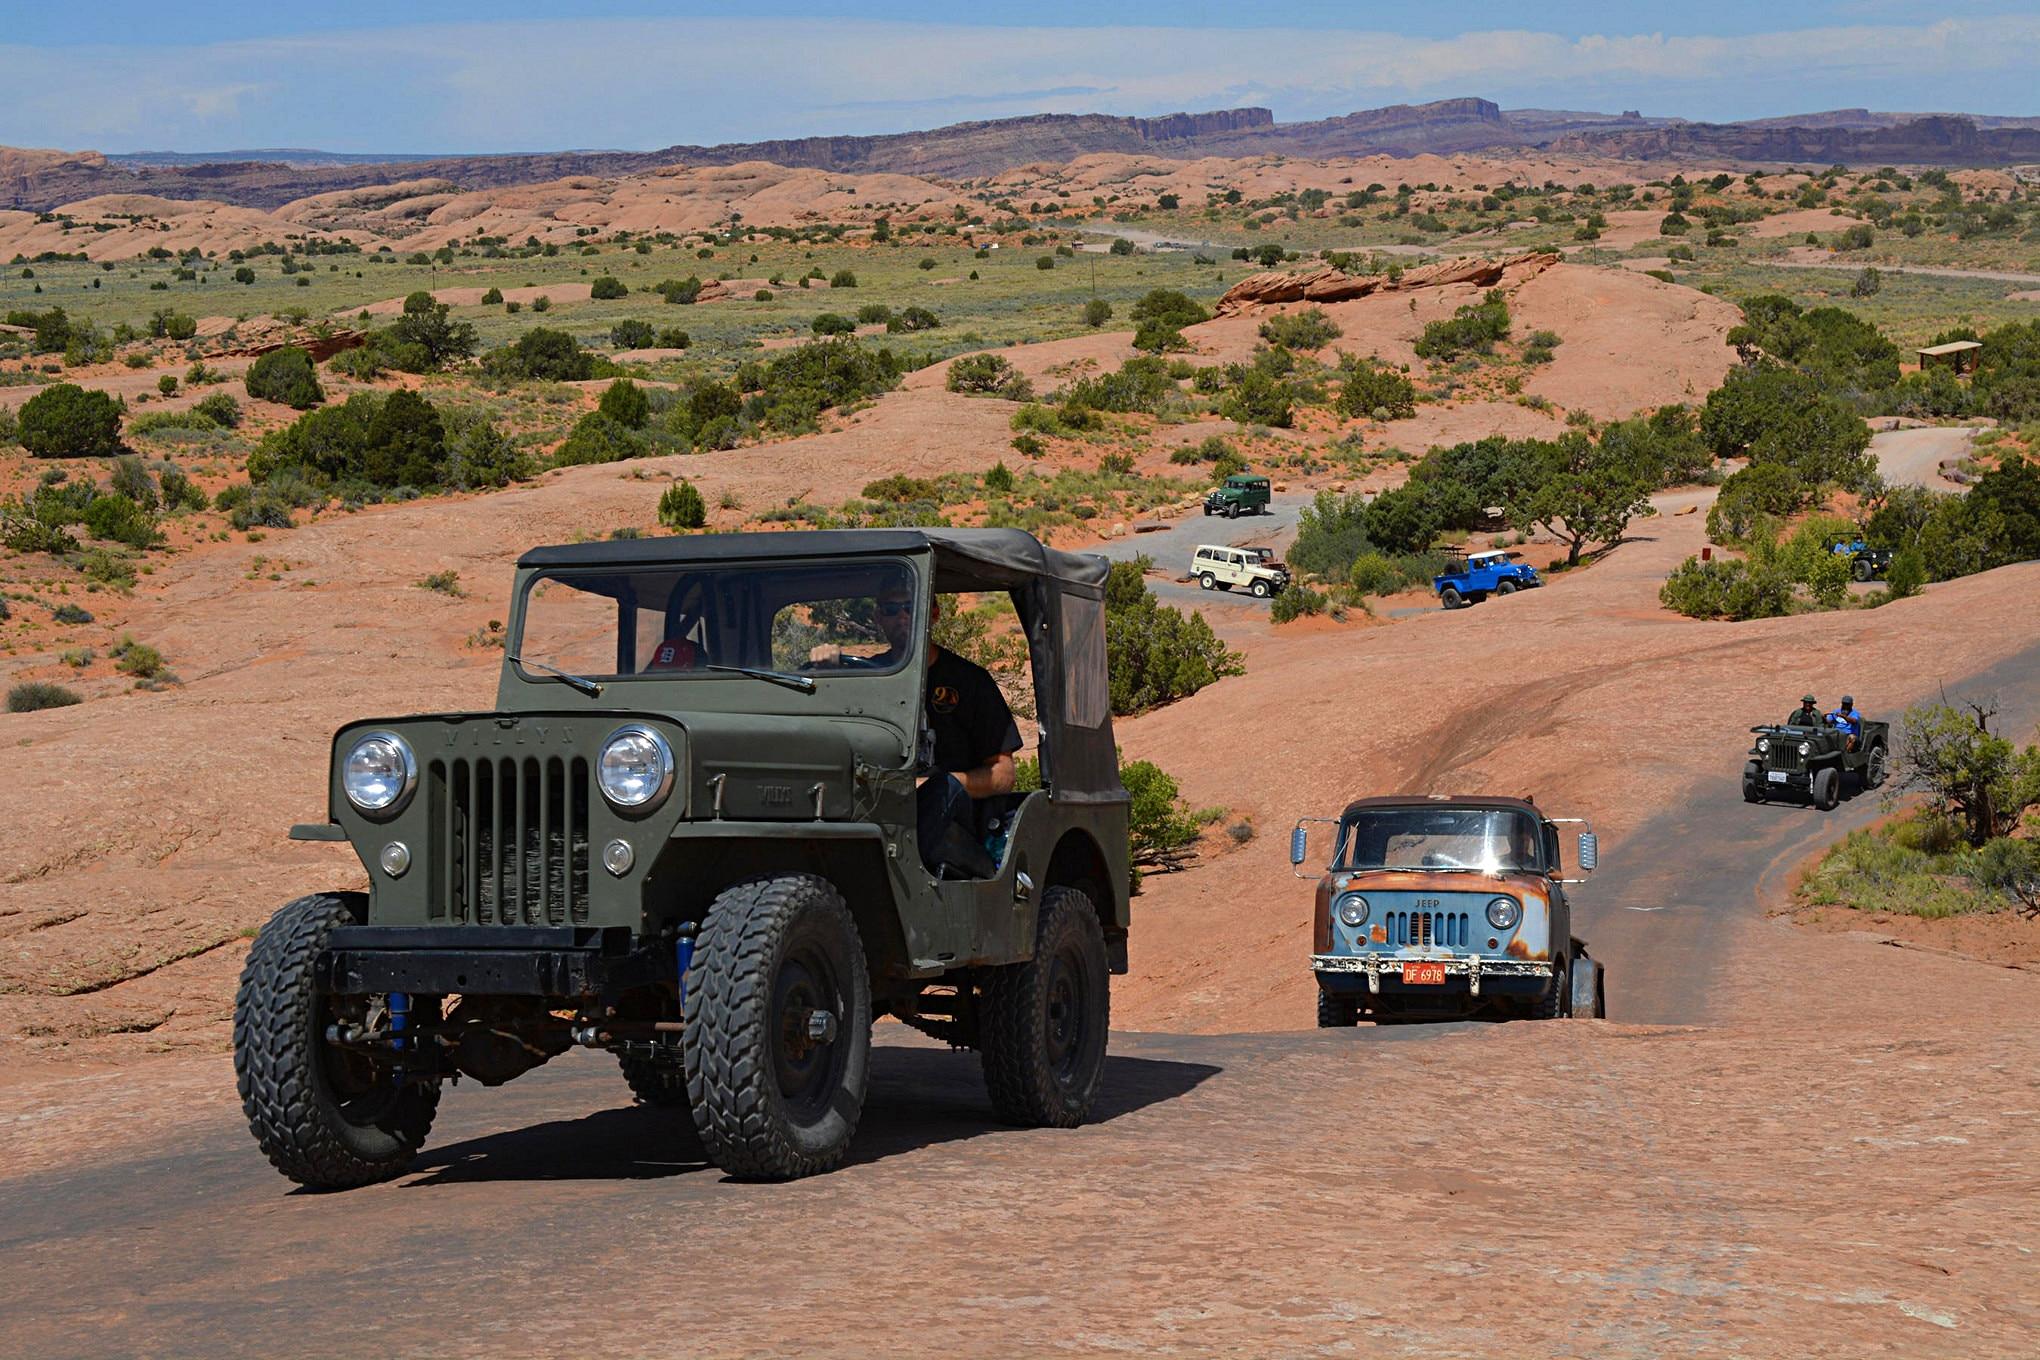 062 willys rally moab 2018 gallery.JPG